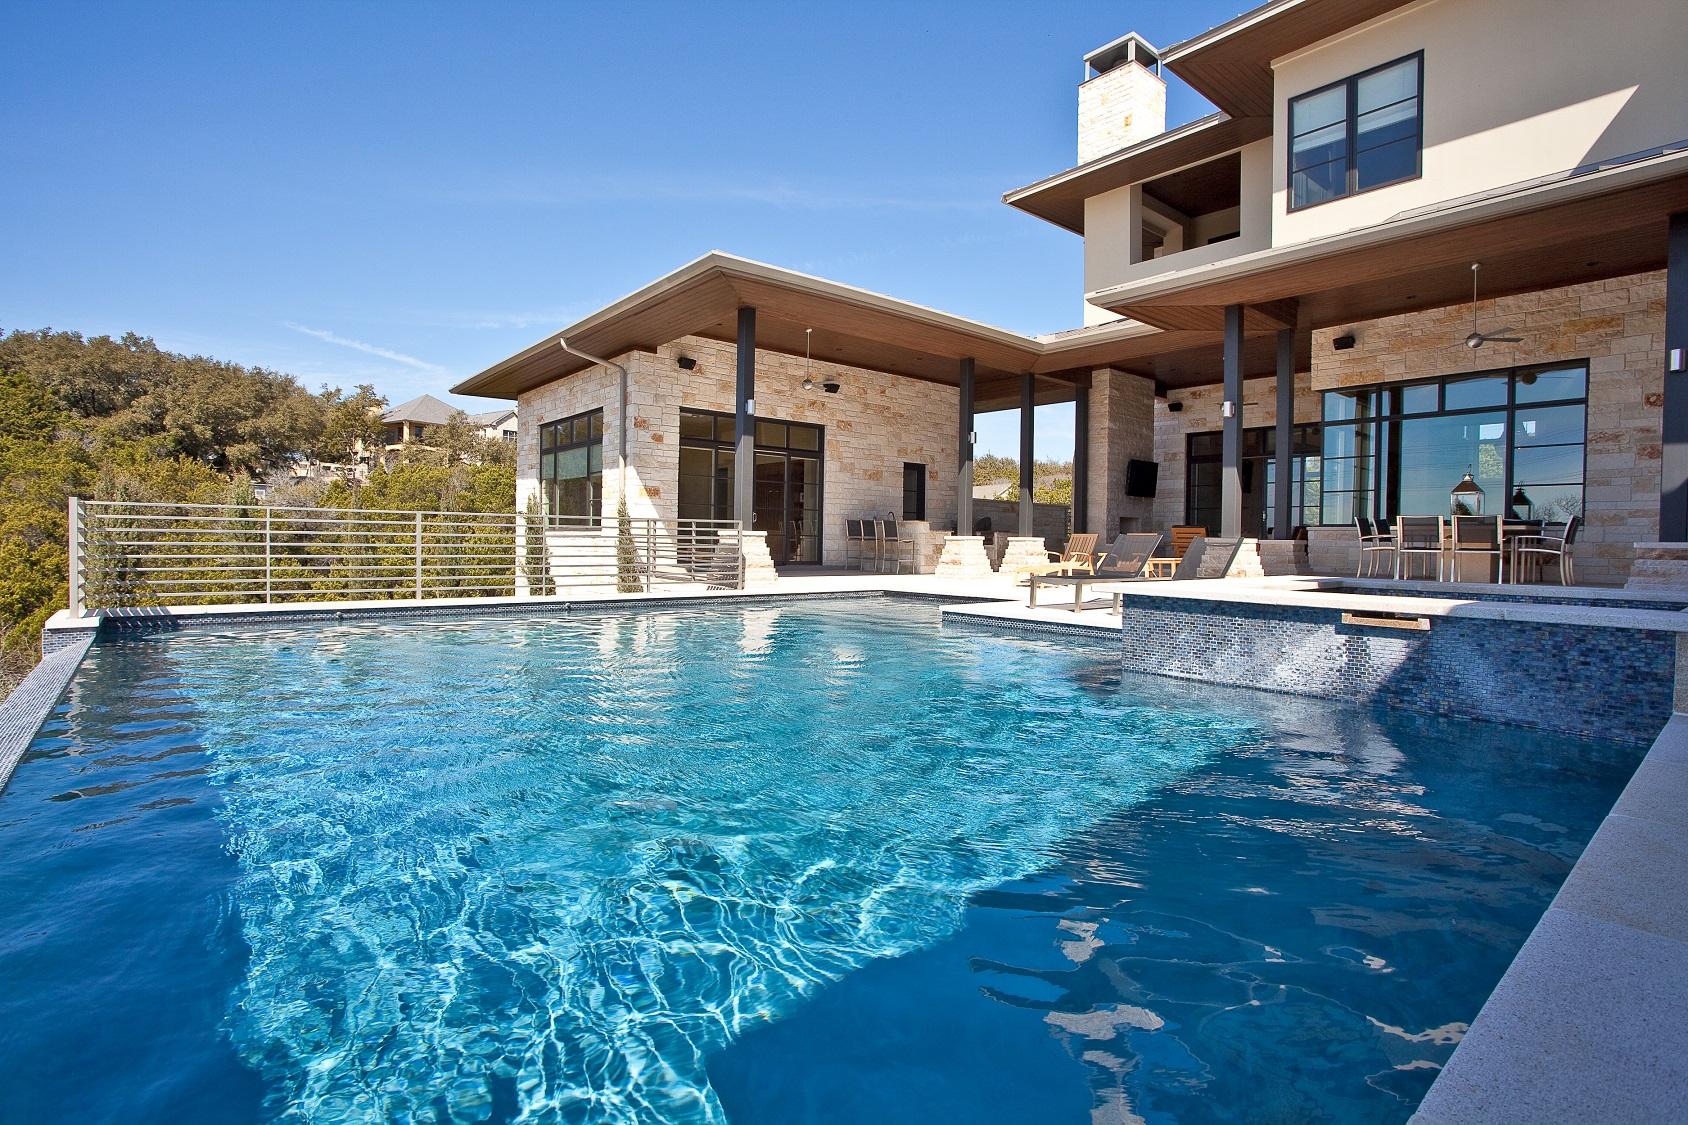 barton-creek-residence-pool